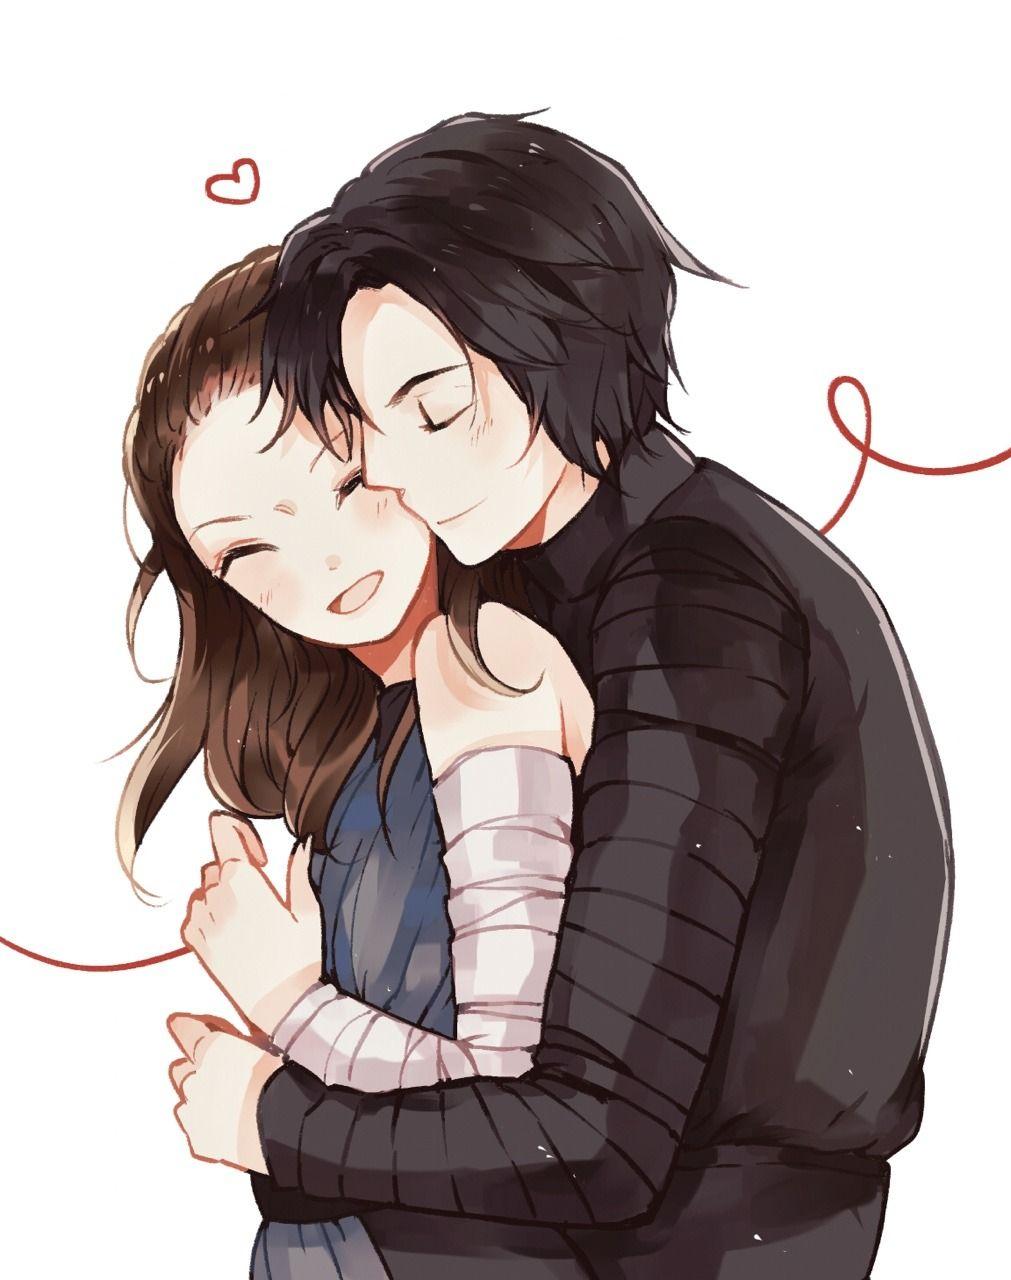 Hug from behind ️ Hug from behind, Anime hug, Anime poses